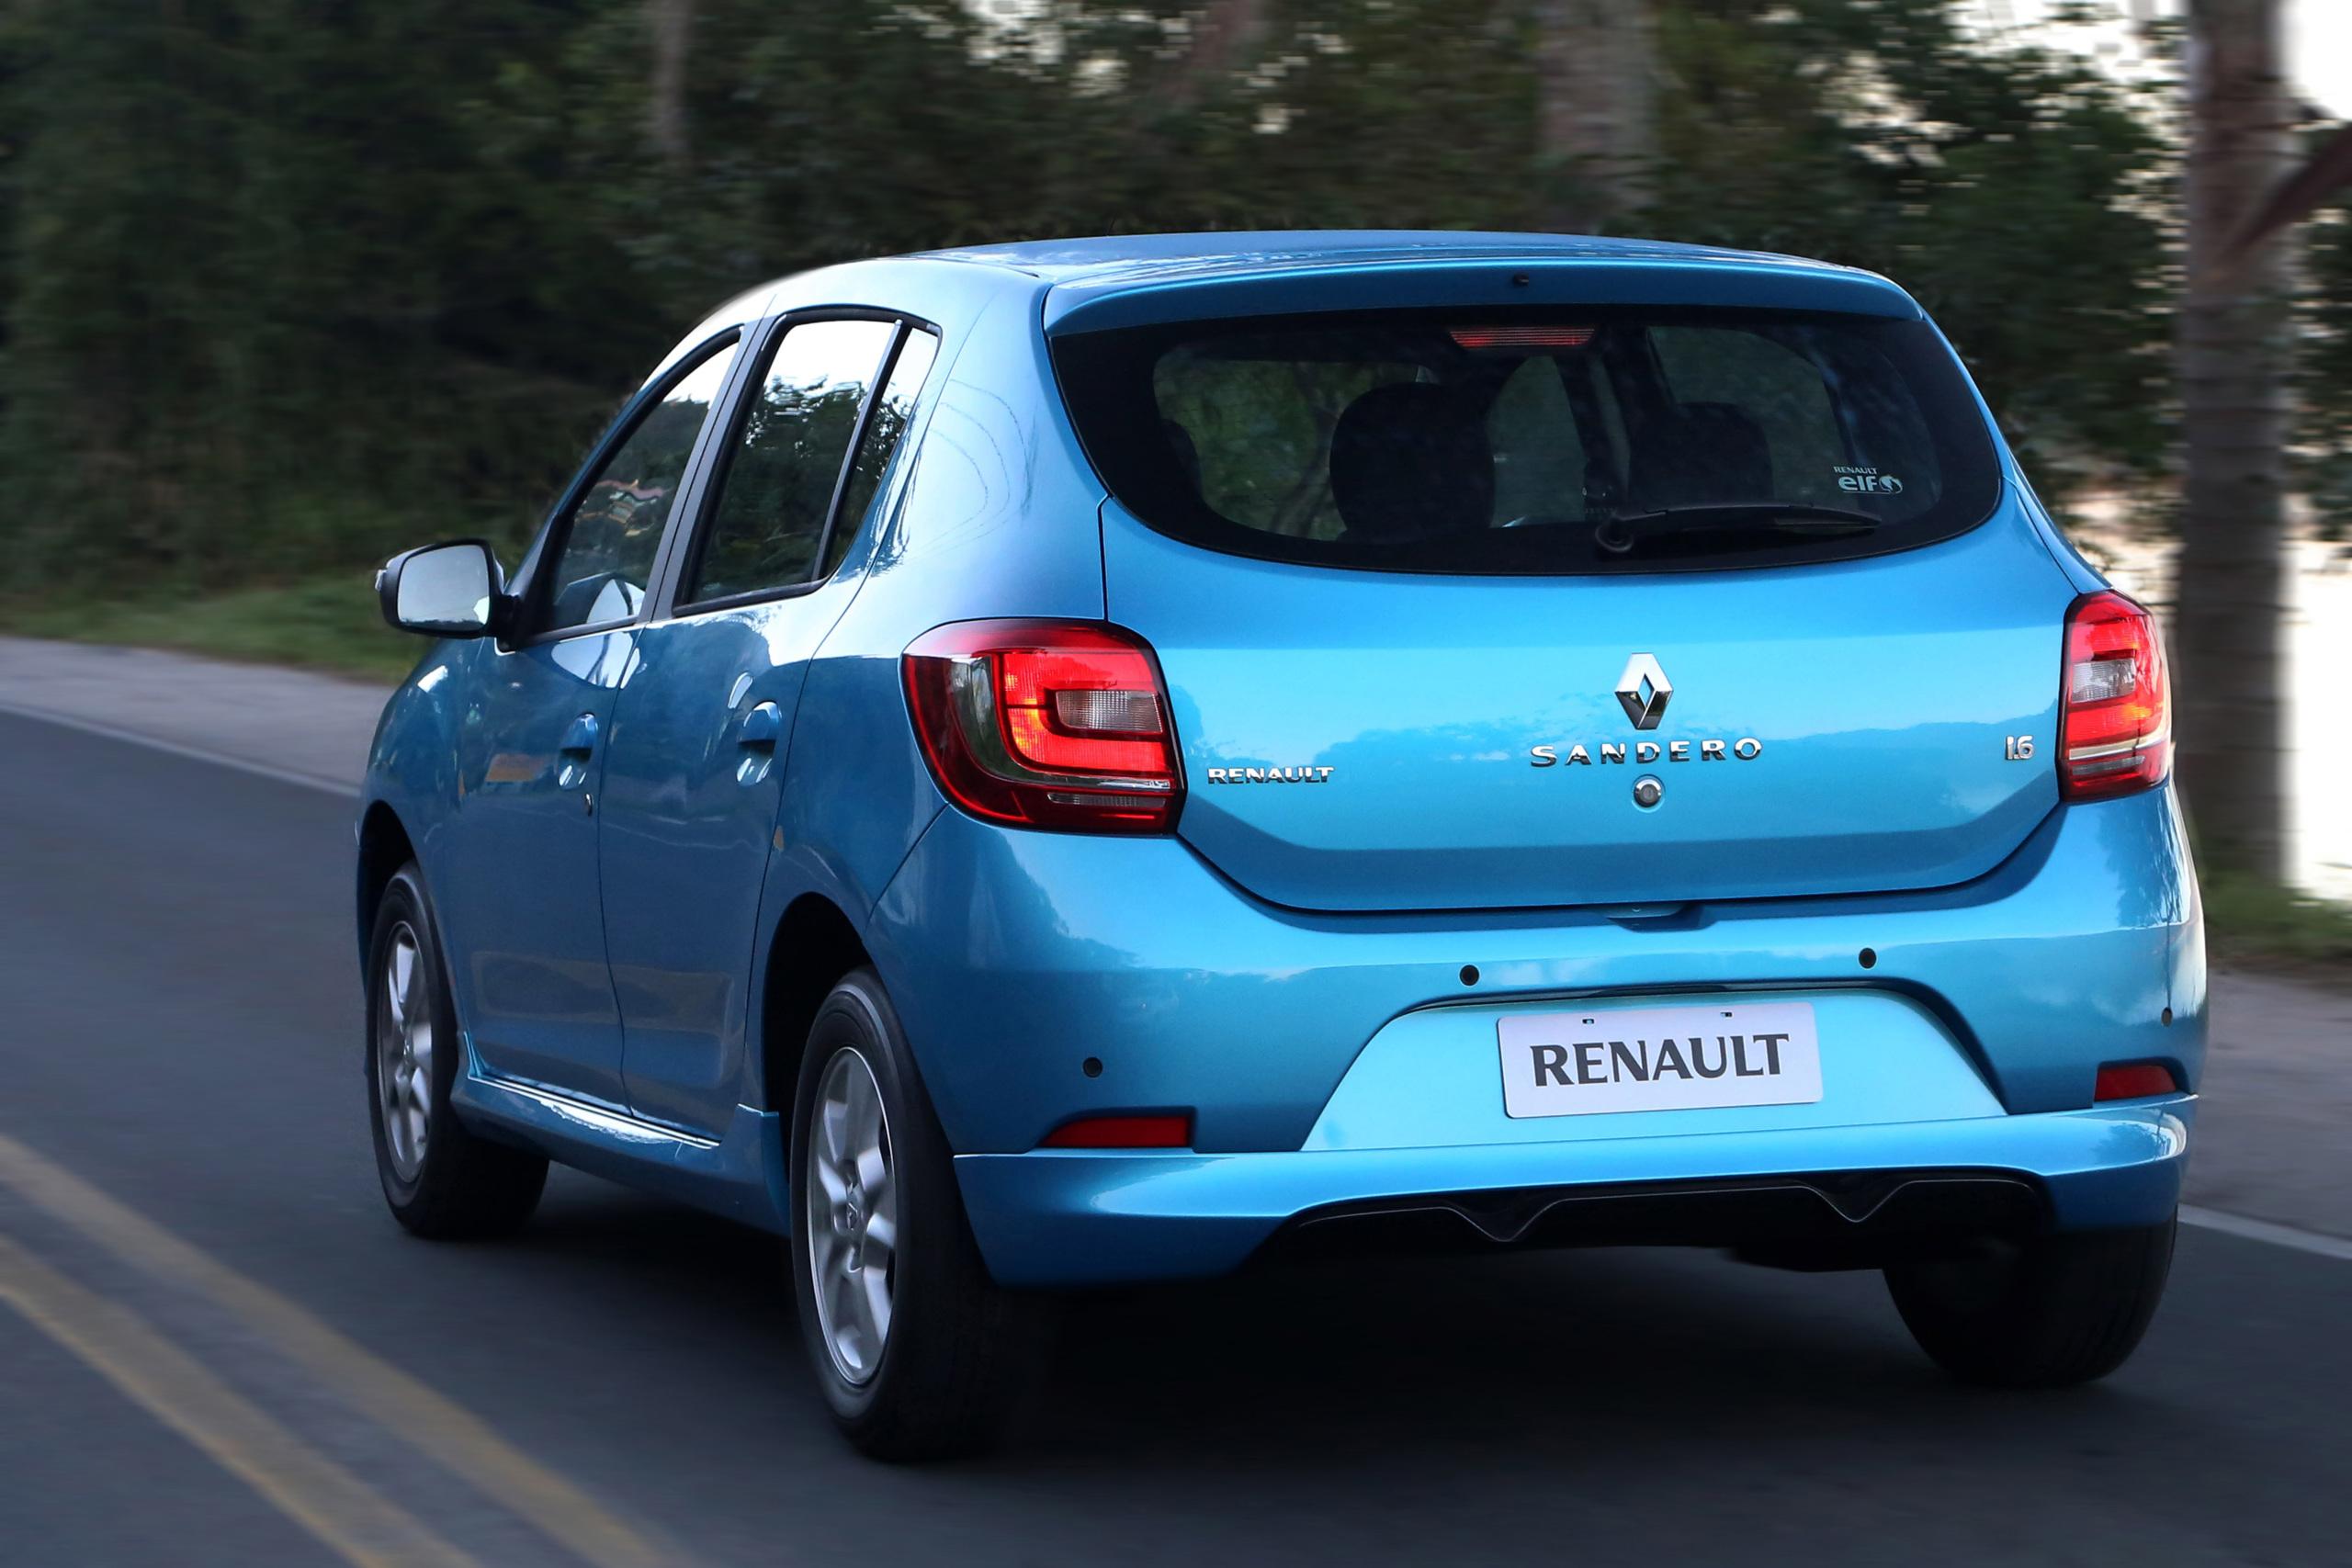 Foto de Renault Sandero 2017 (11/11)